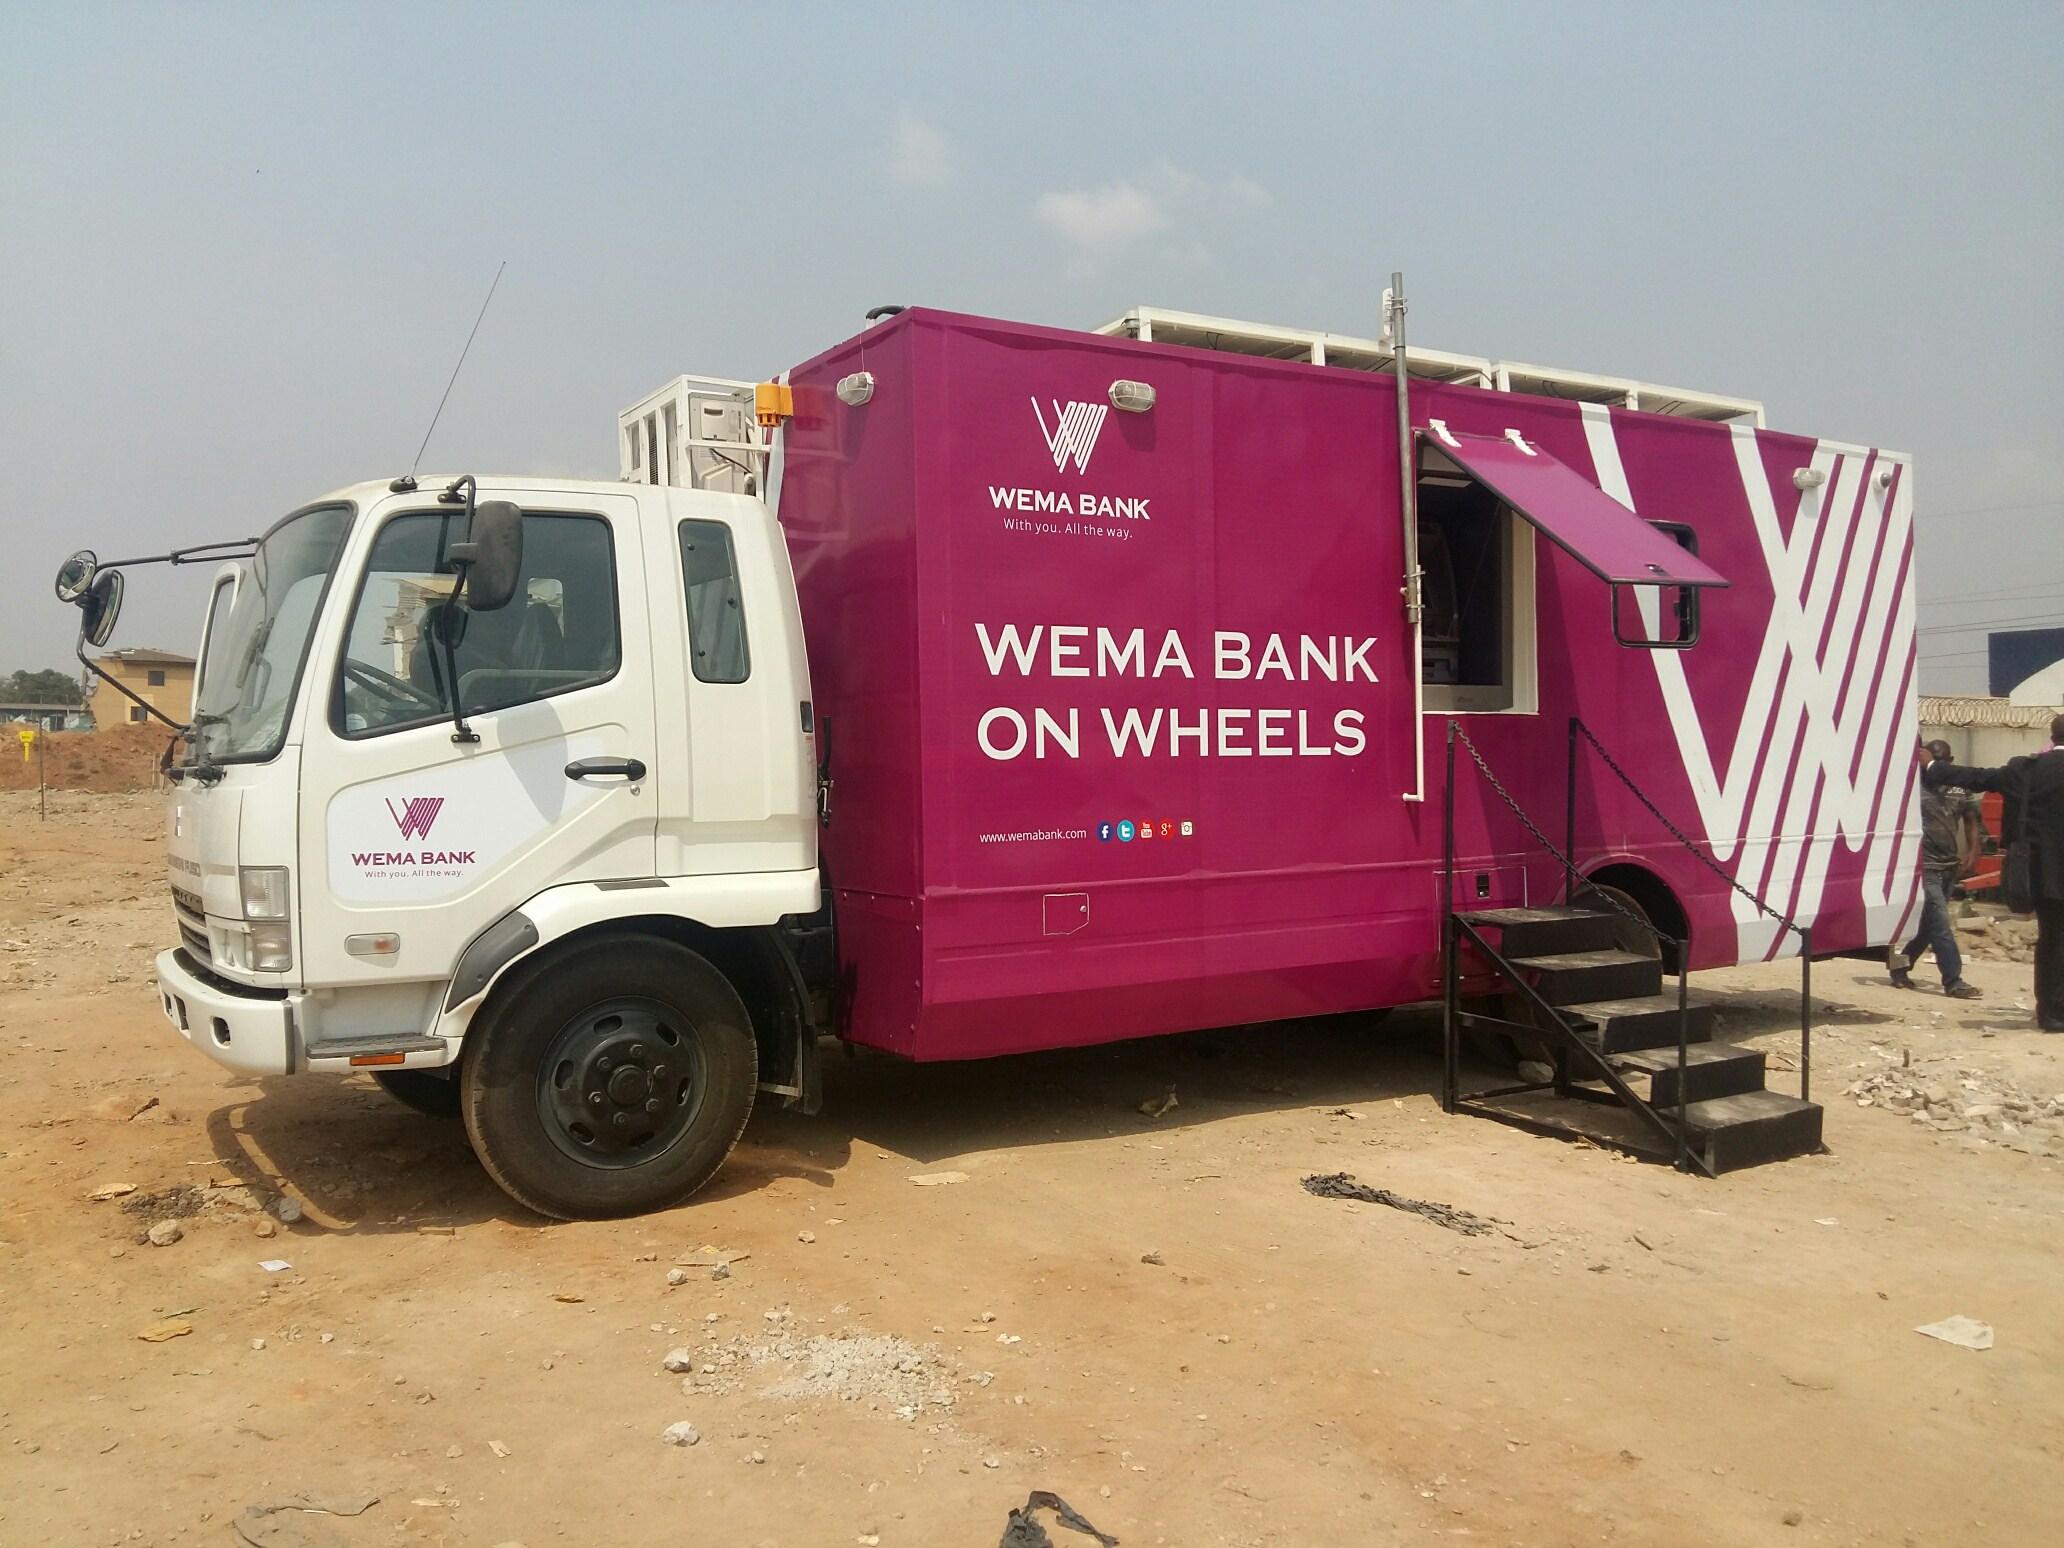 Wema bank on wheels // Photo Via trailblazersng.com